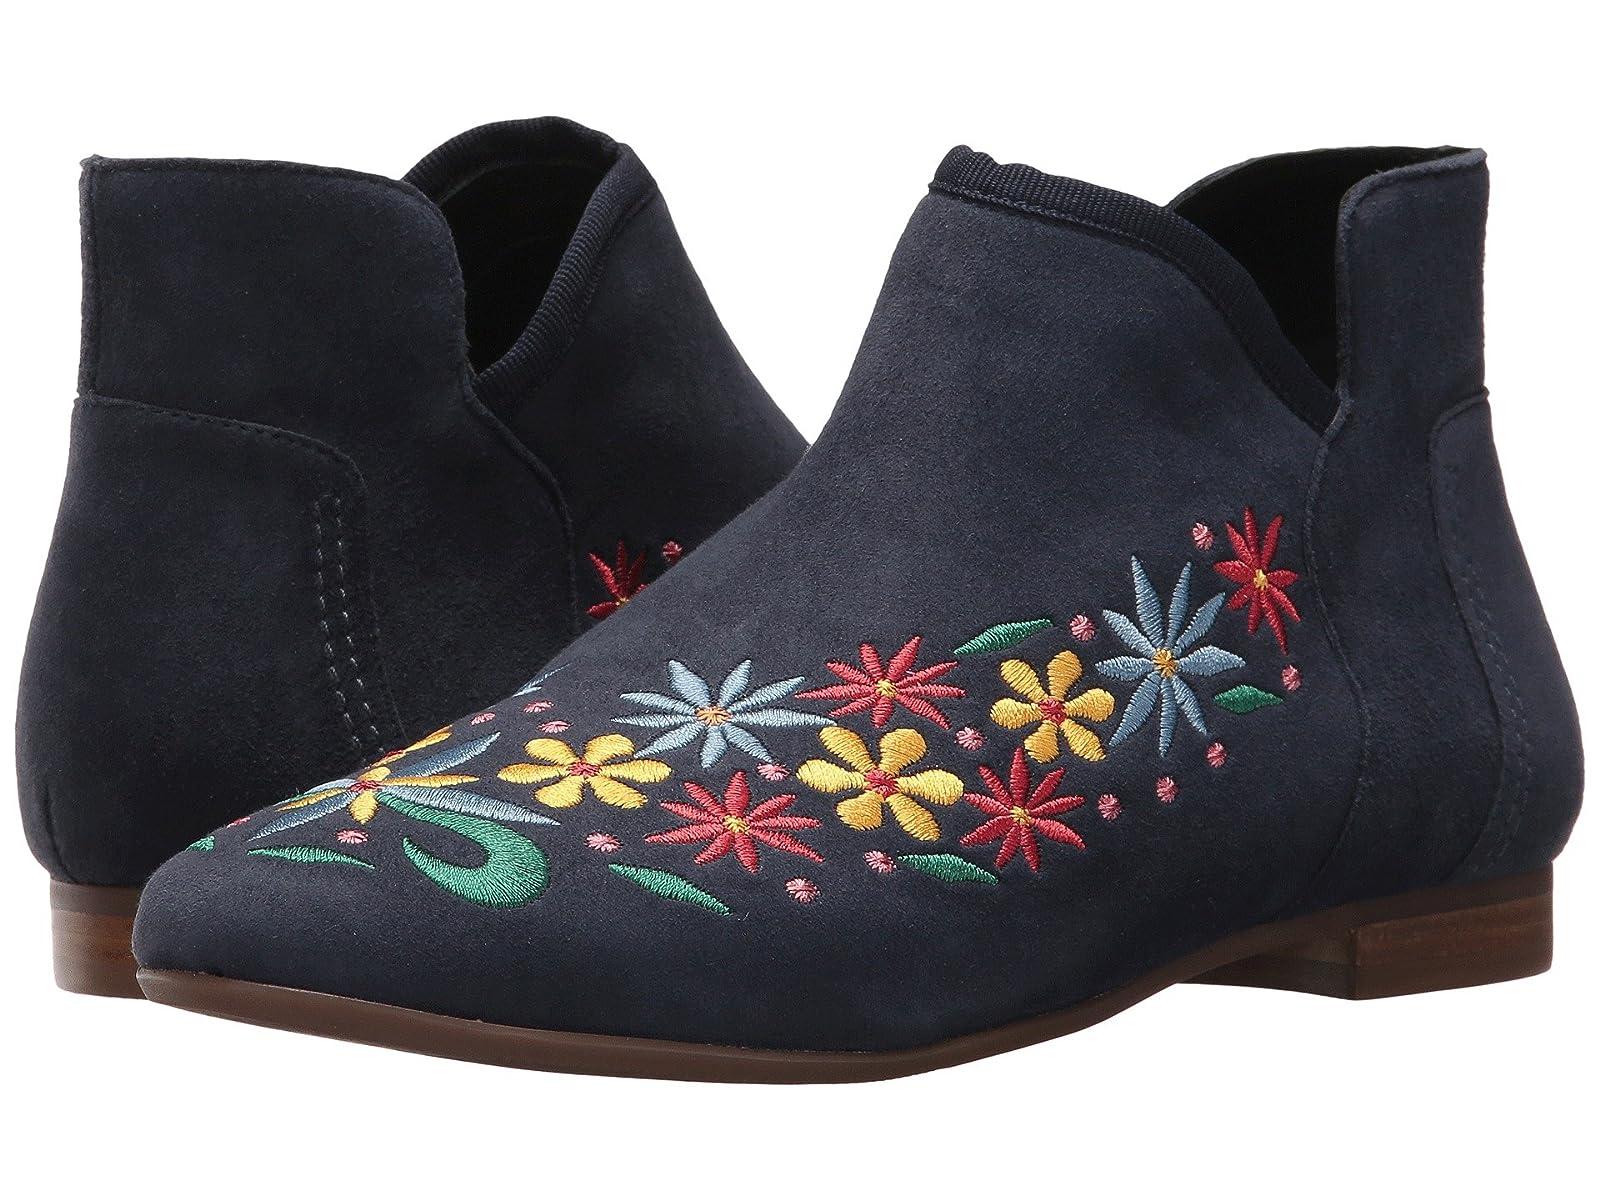 Bernardo FrancineCheap and distinctive eye-catching shoes